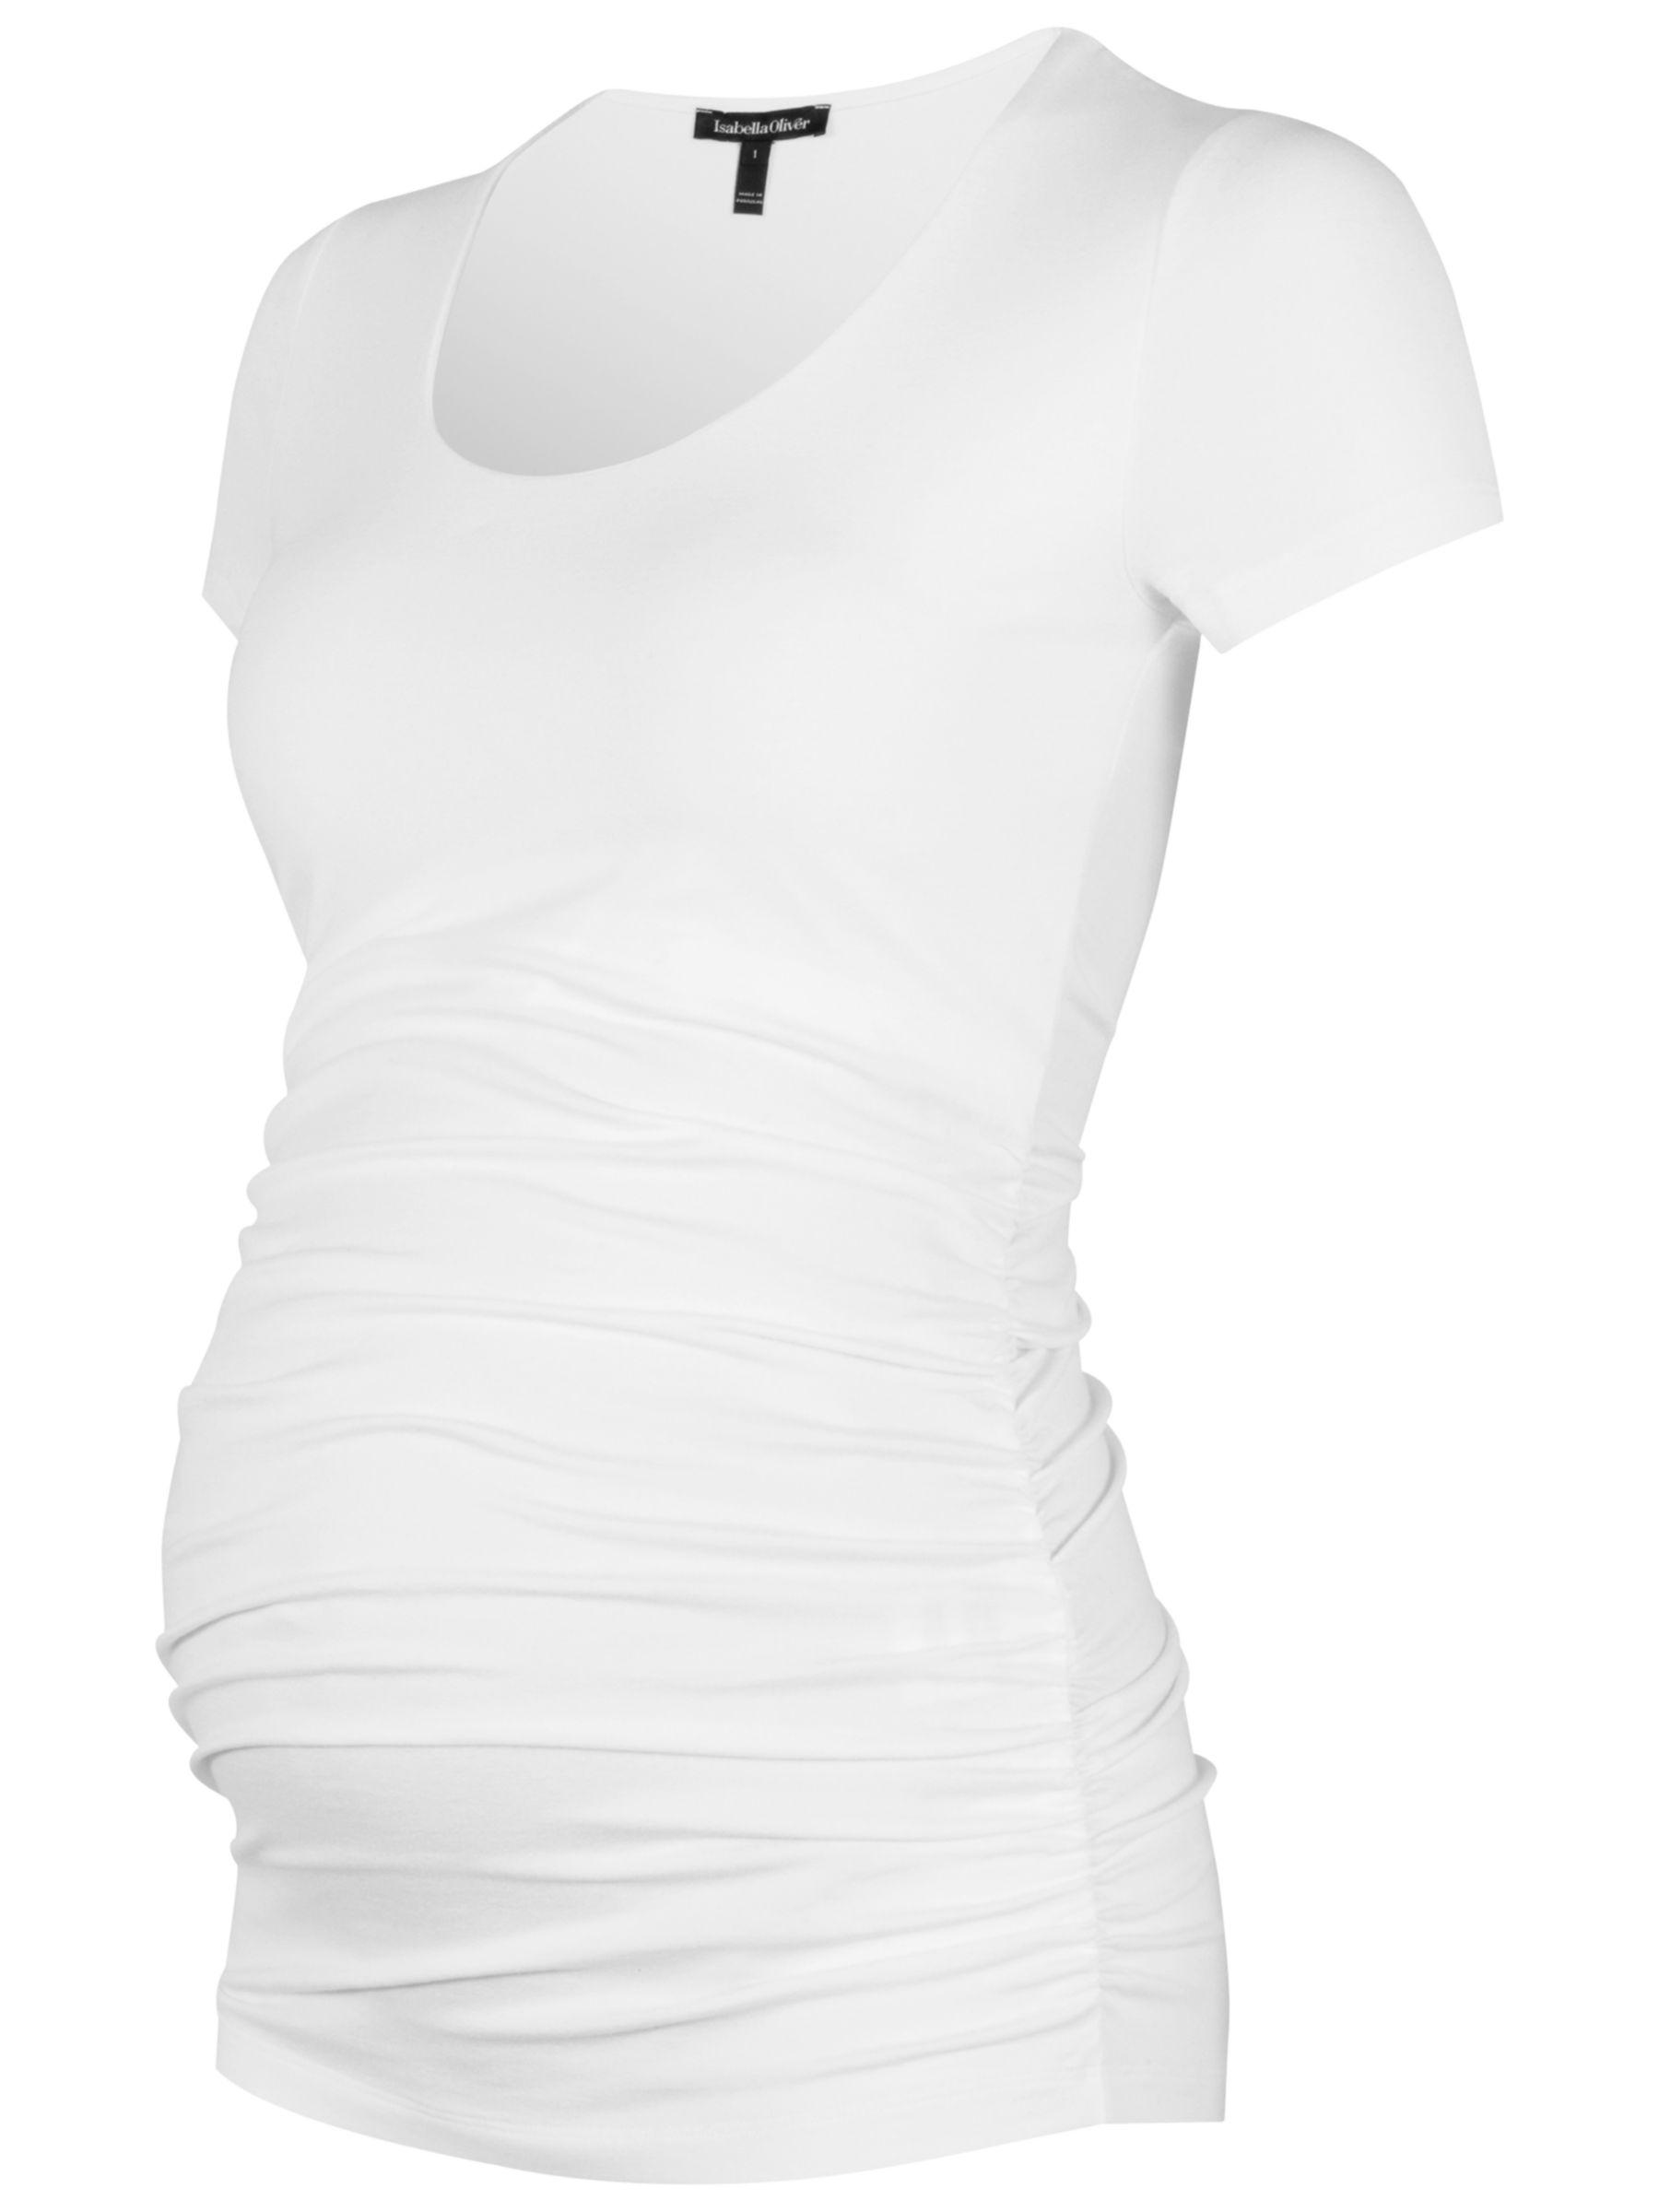 Isabella Oliver Isabella Oliver Ruched Maternity T-Shirt, White